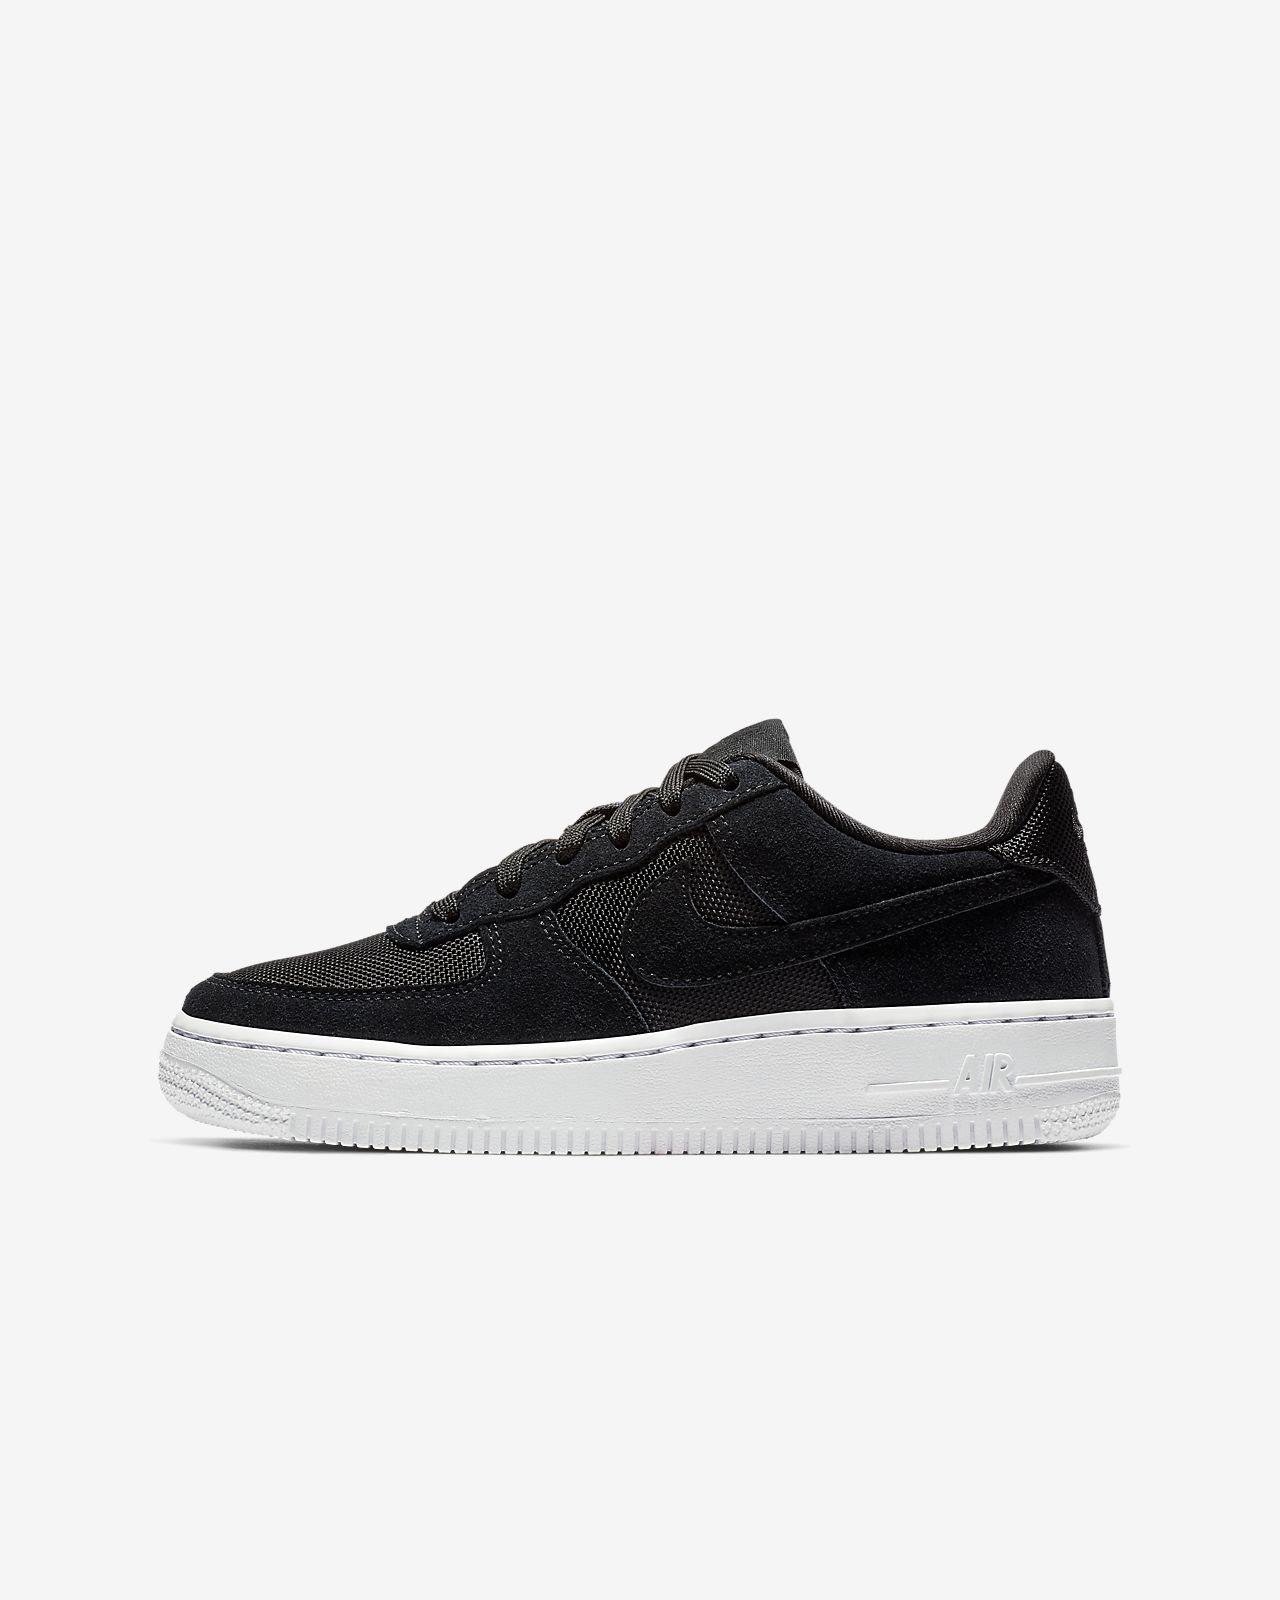 Nike Air Force 1-1 Zapatillas - Niño/a